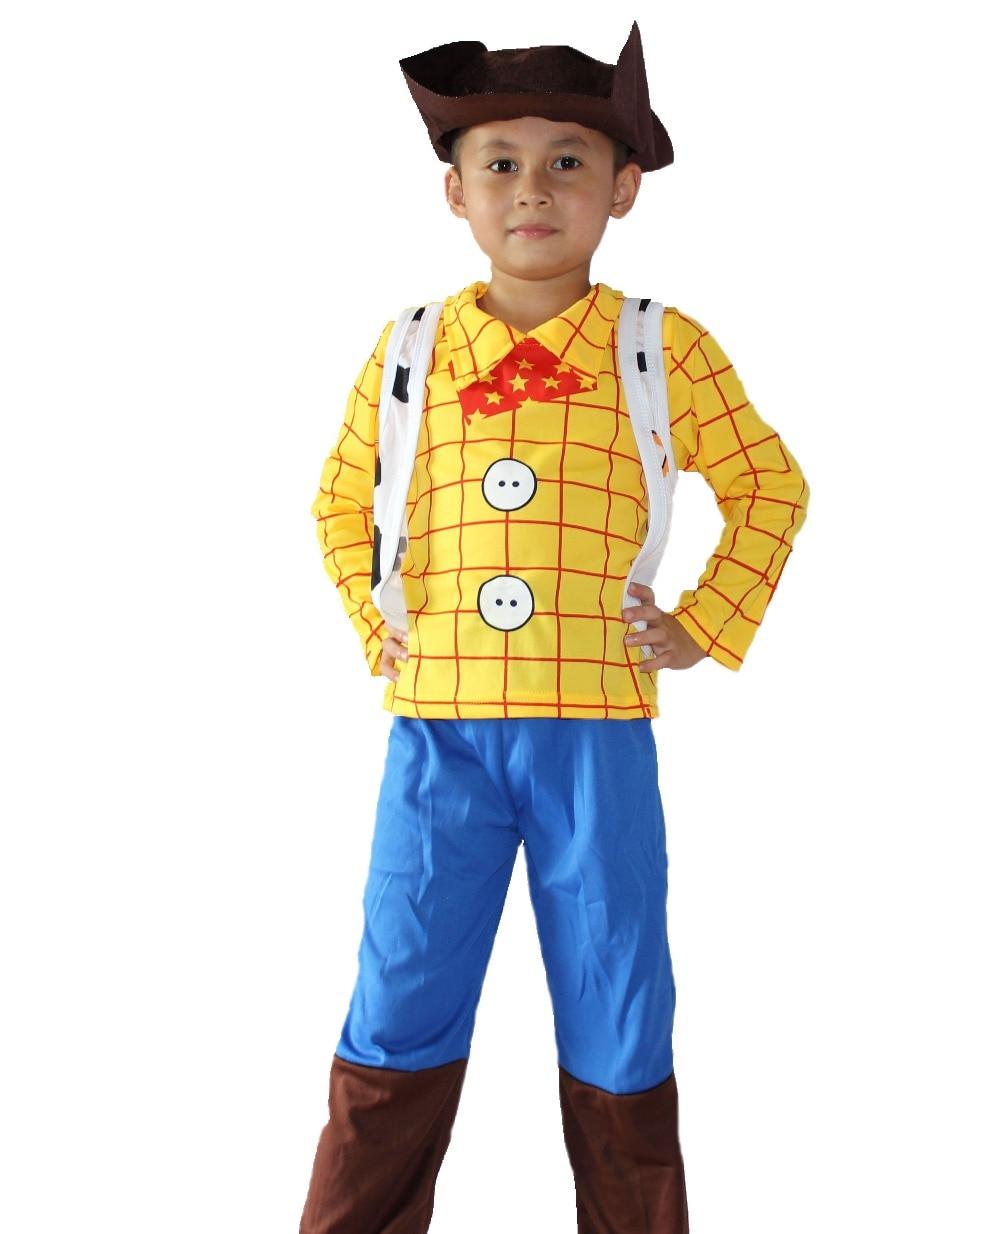 3-7 anni Boy Toy Story Role-playing cosplay legnoso, costumi di - Costumi di carnevale